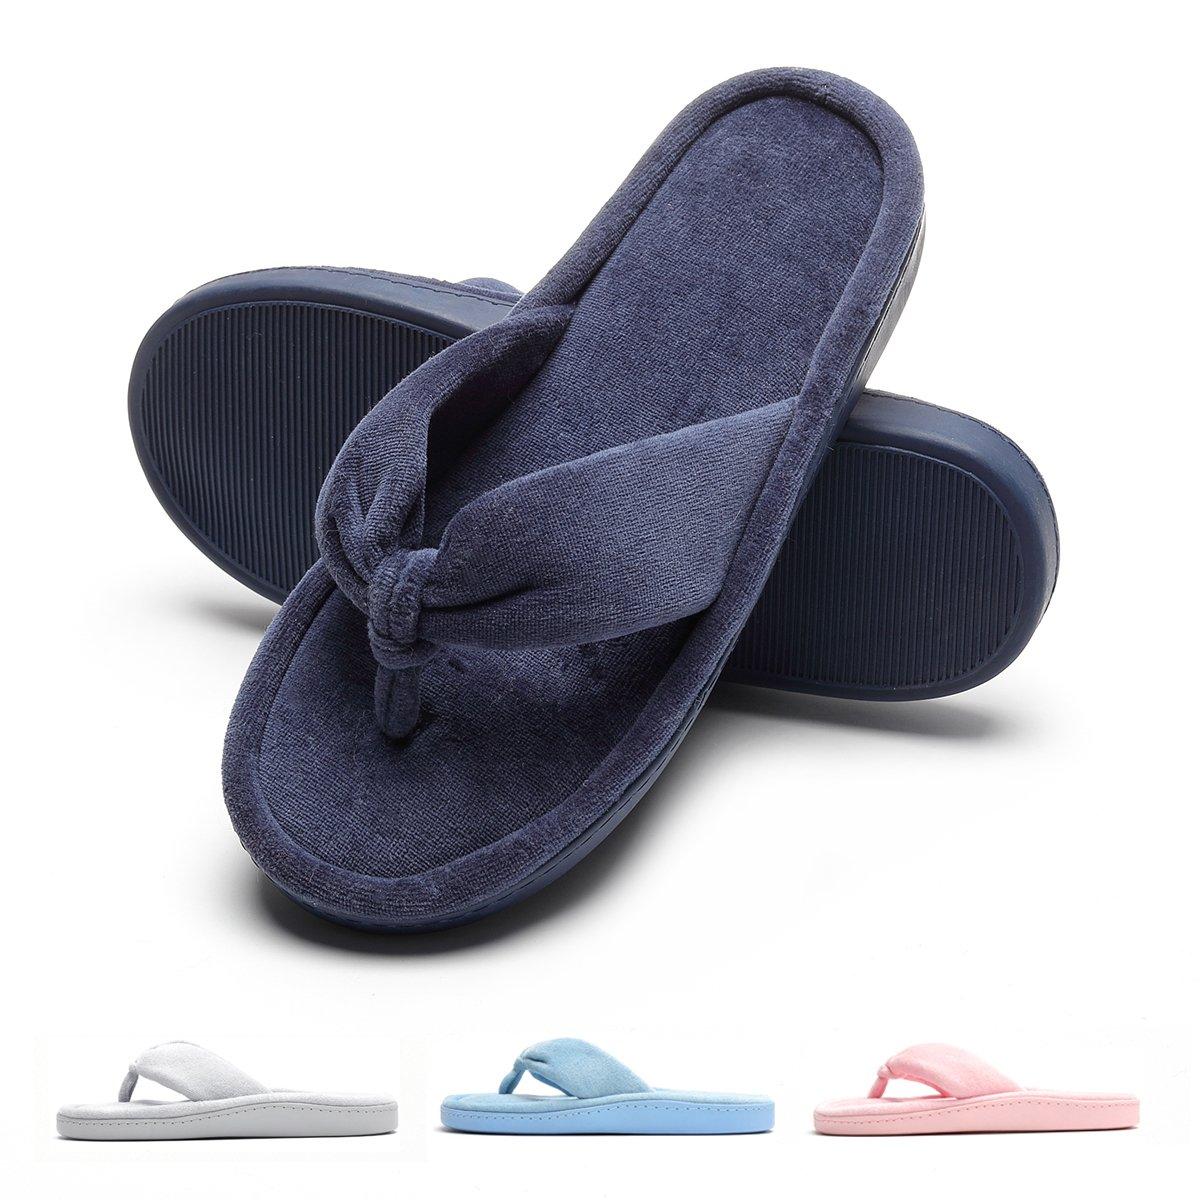 Women's Antibacterial Velvet Cozy Comfy Slippers Soft Anti Slip TPR Rubber Sole Navy Blue L